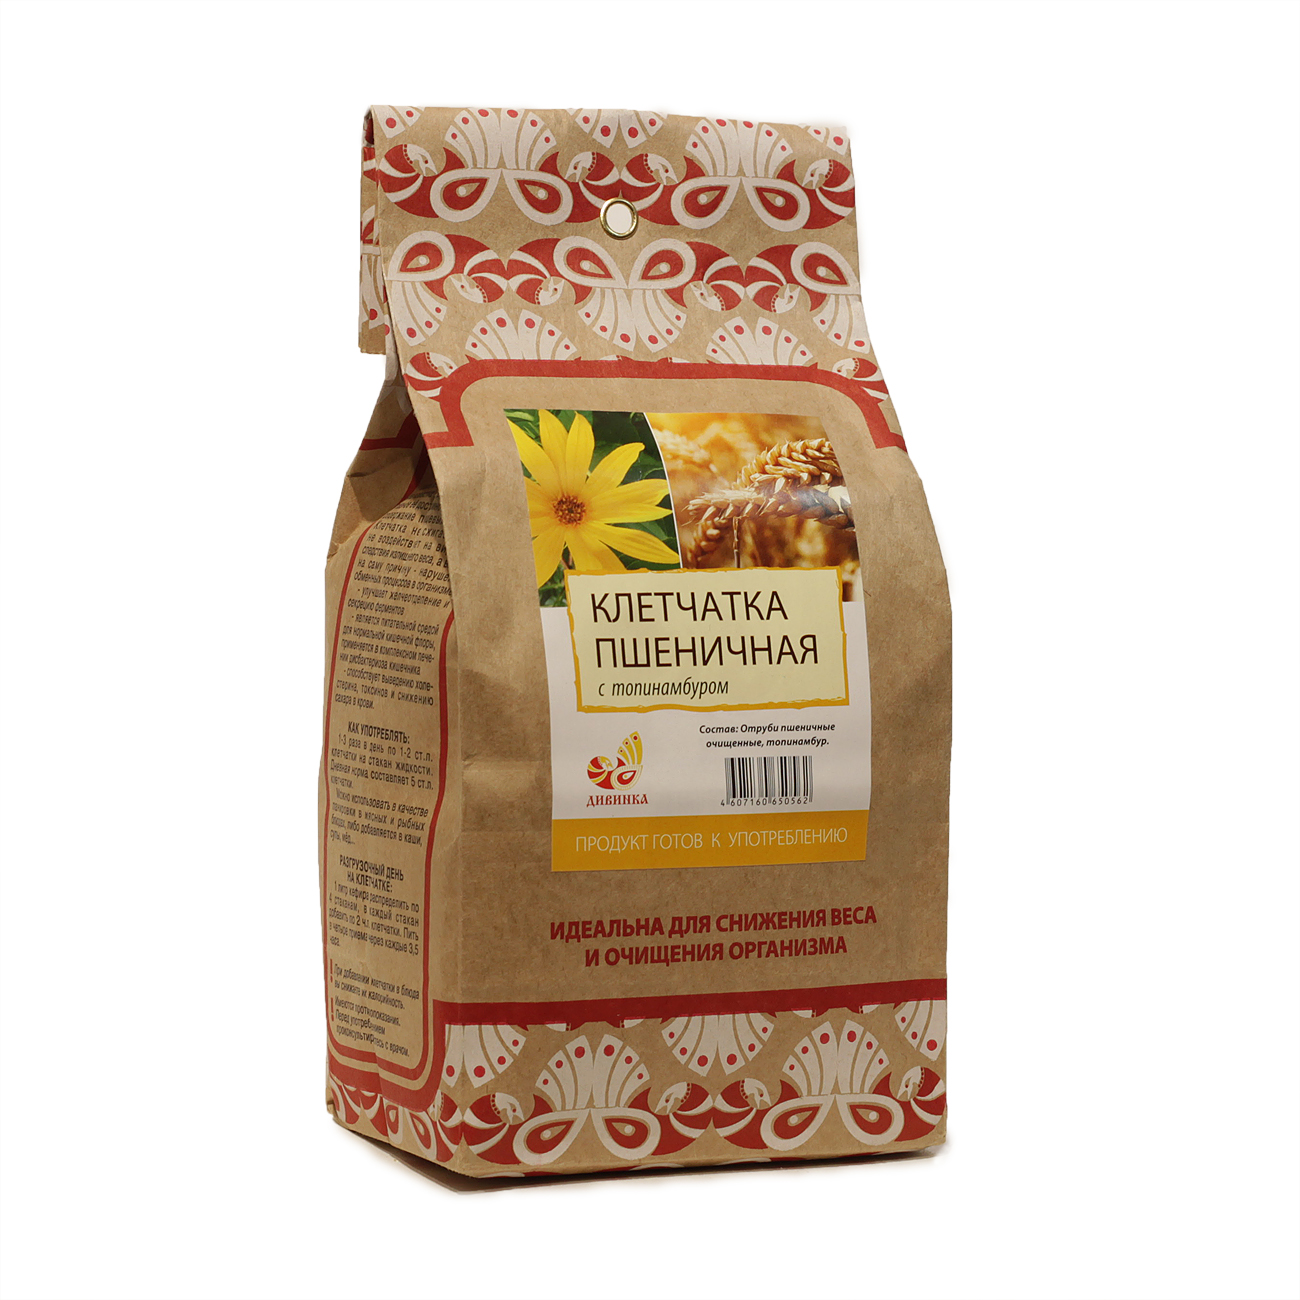 Клетчатка пшеничная Топинамбур пакет 300гр